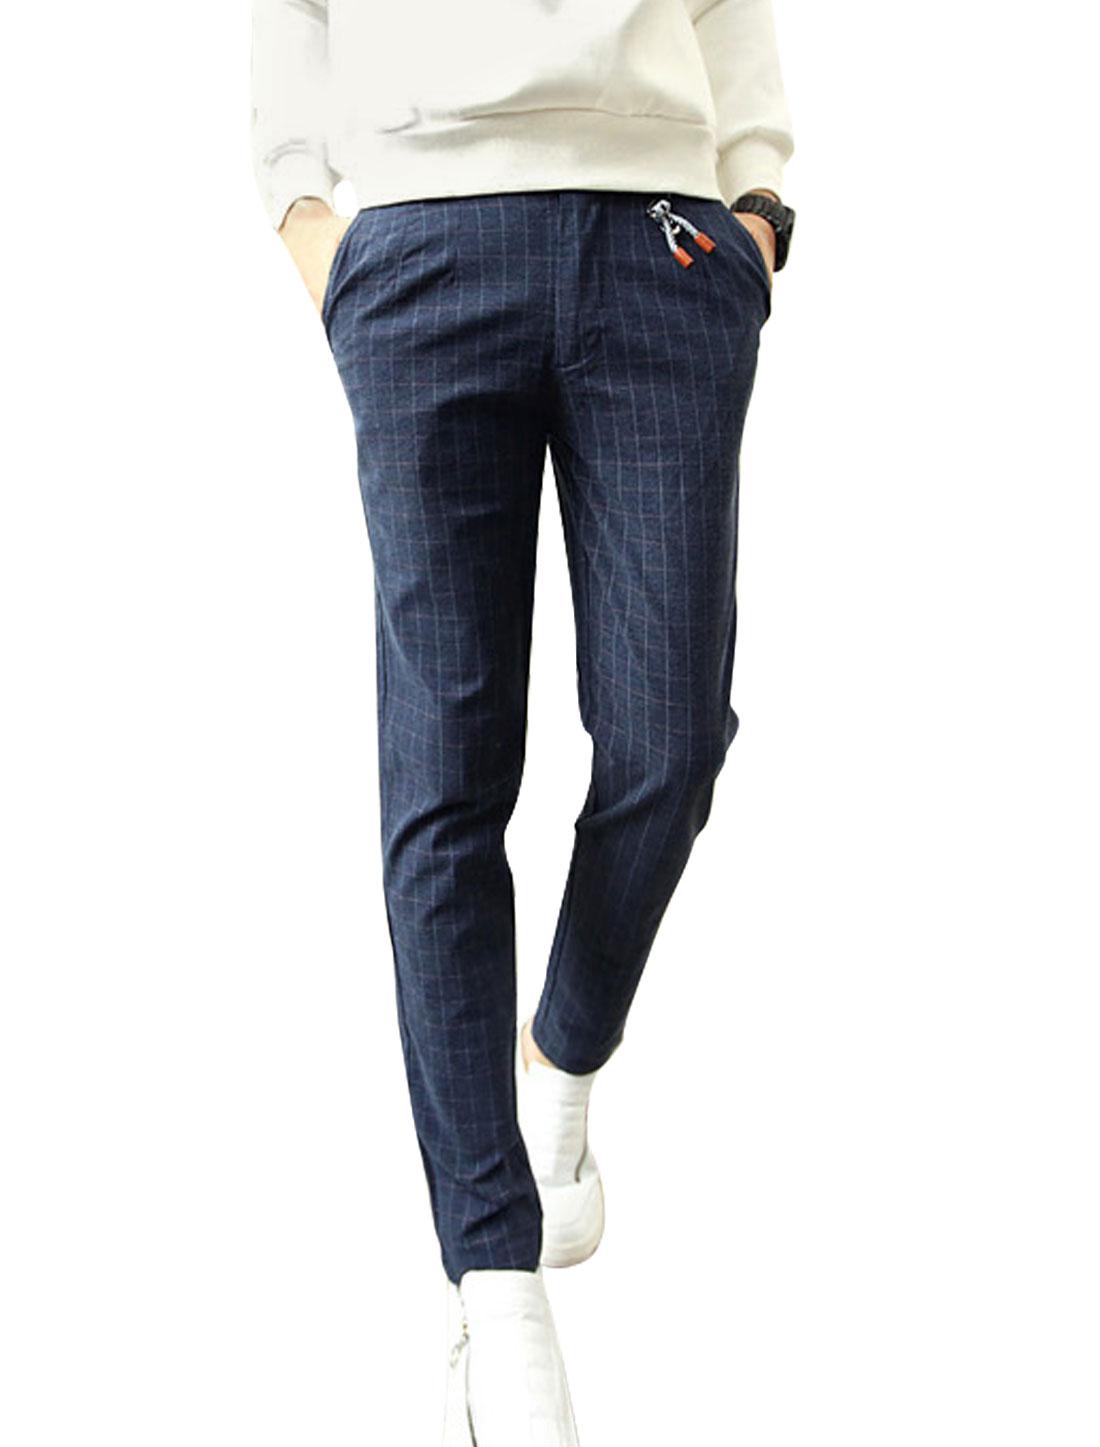 Men Dusty Purple Plaids Mid Waist Belt Loop Button Closure Zip Fly Straight Pants W30